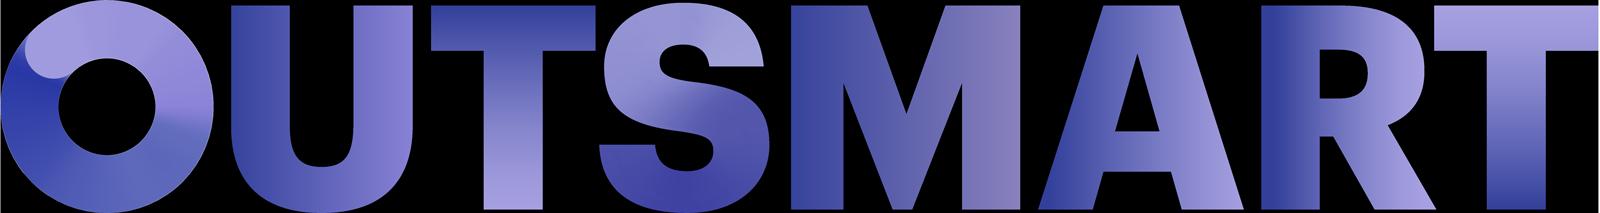 Outsmart Logo